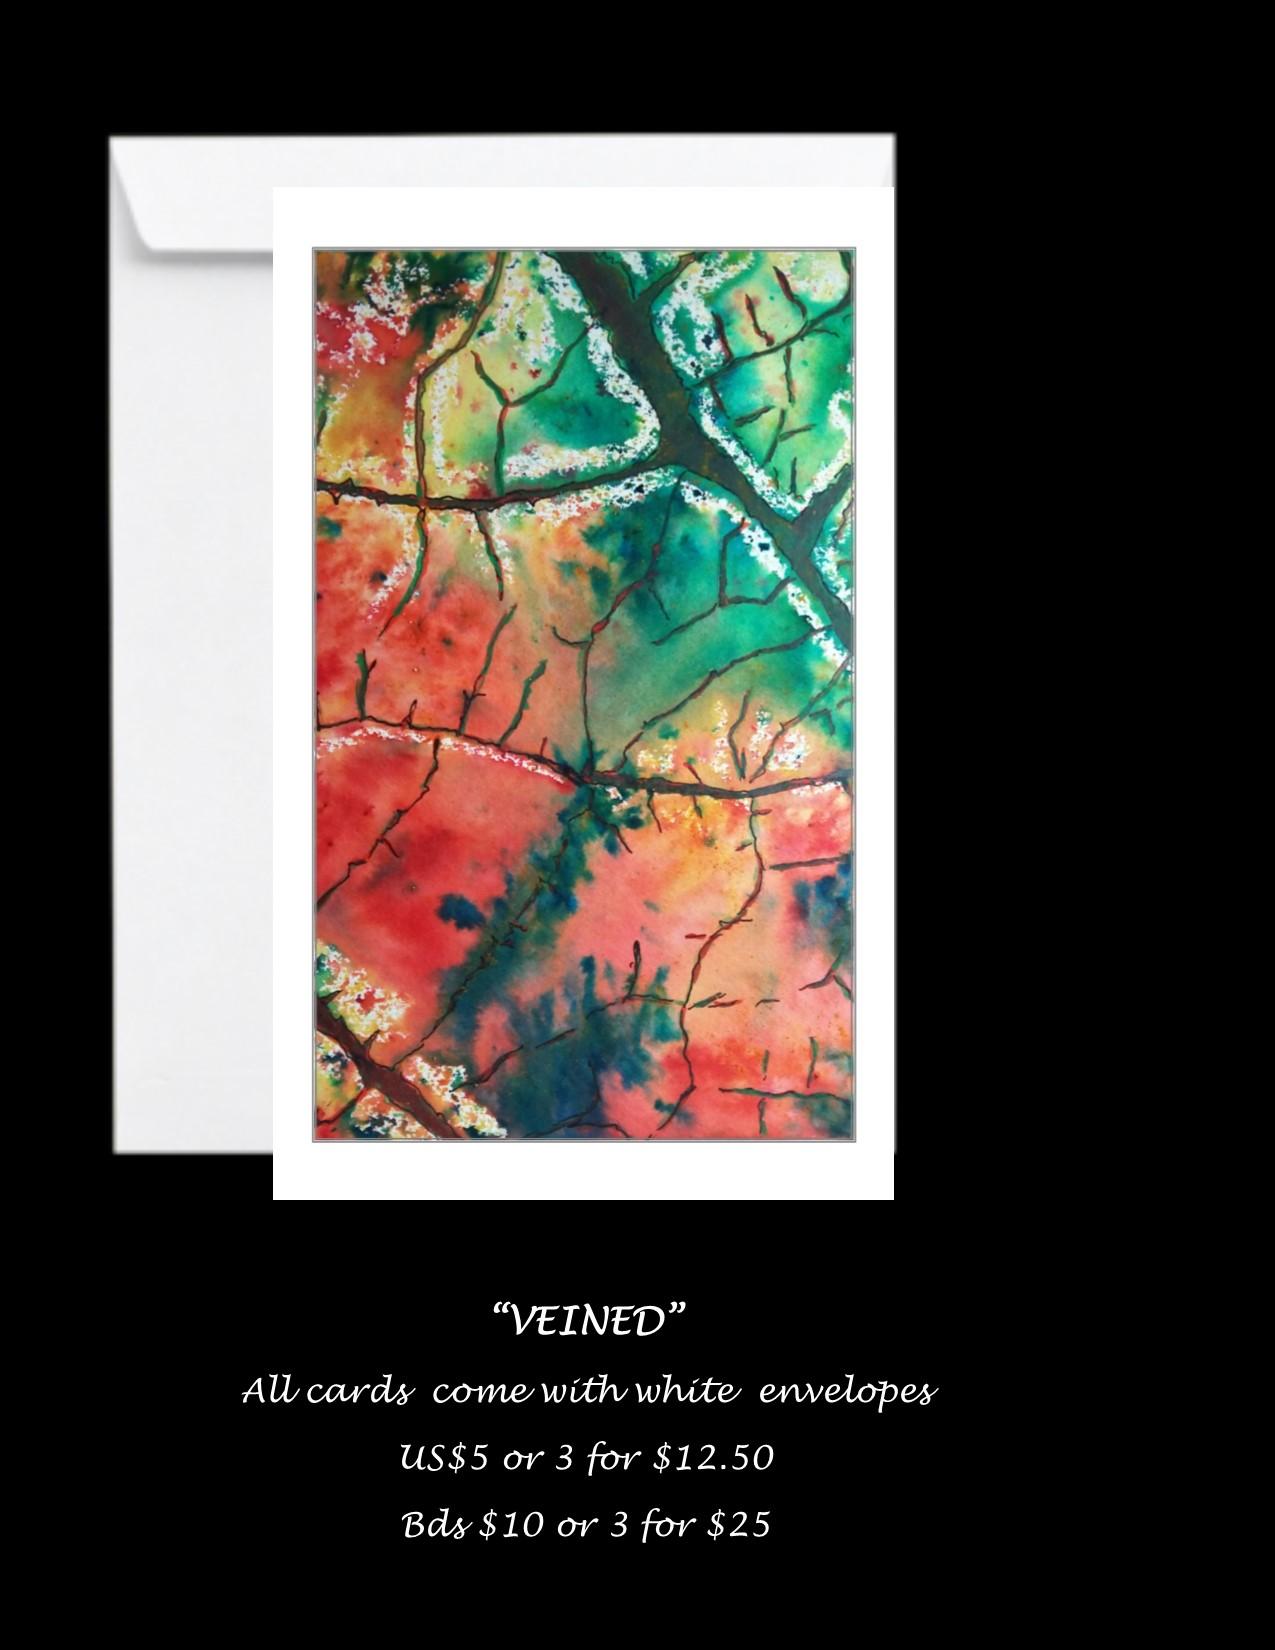 Veined-08